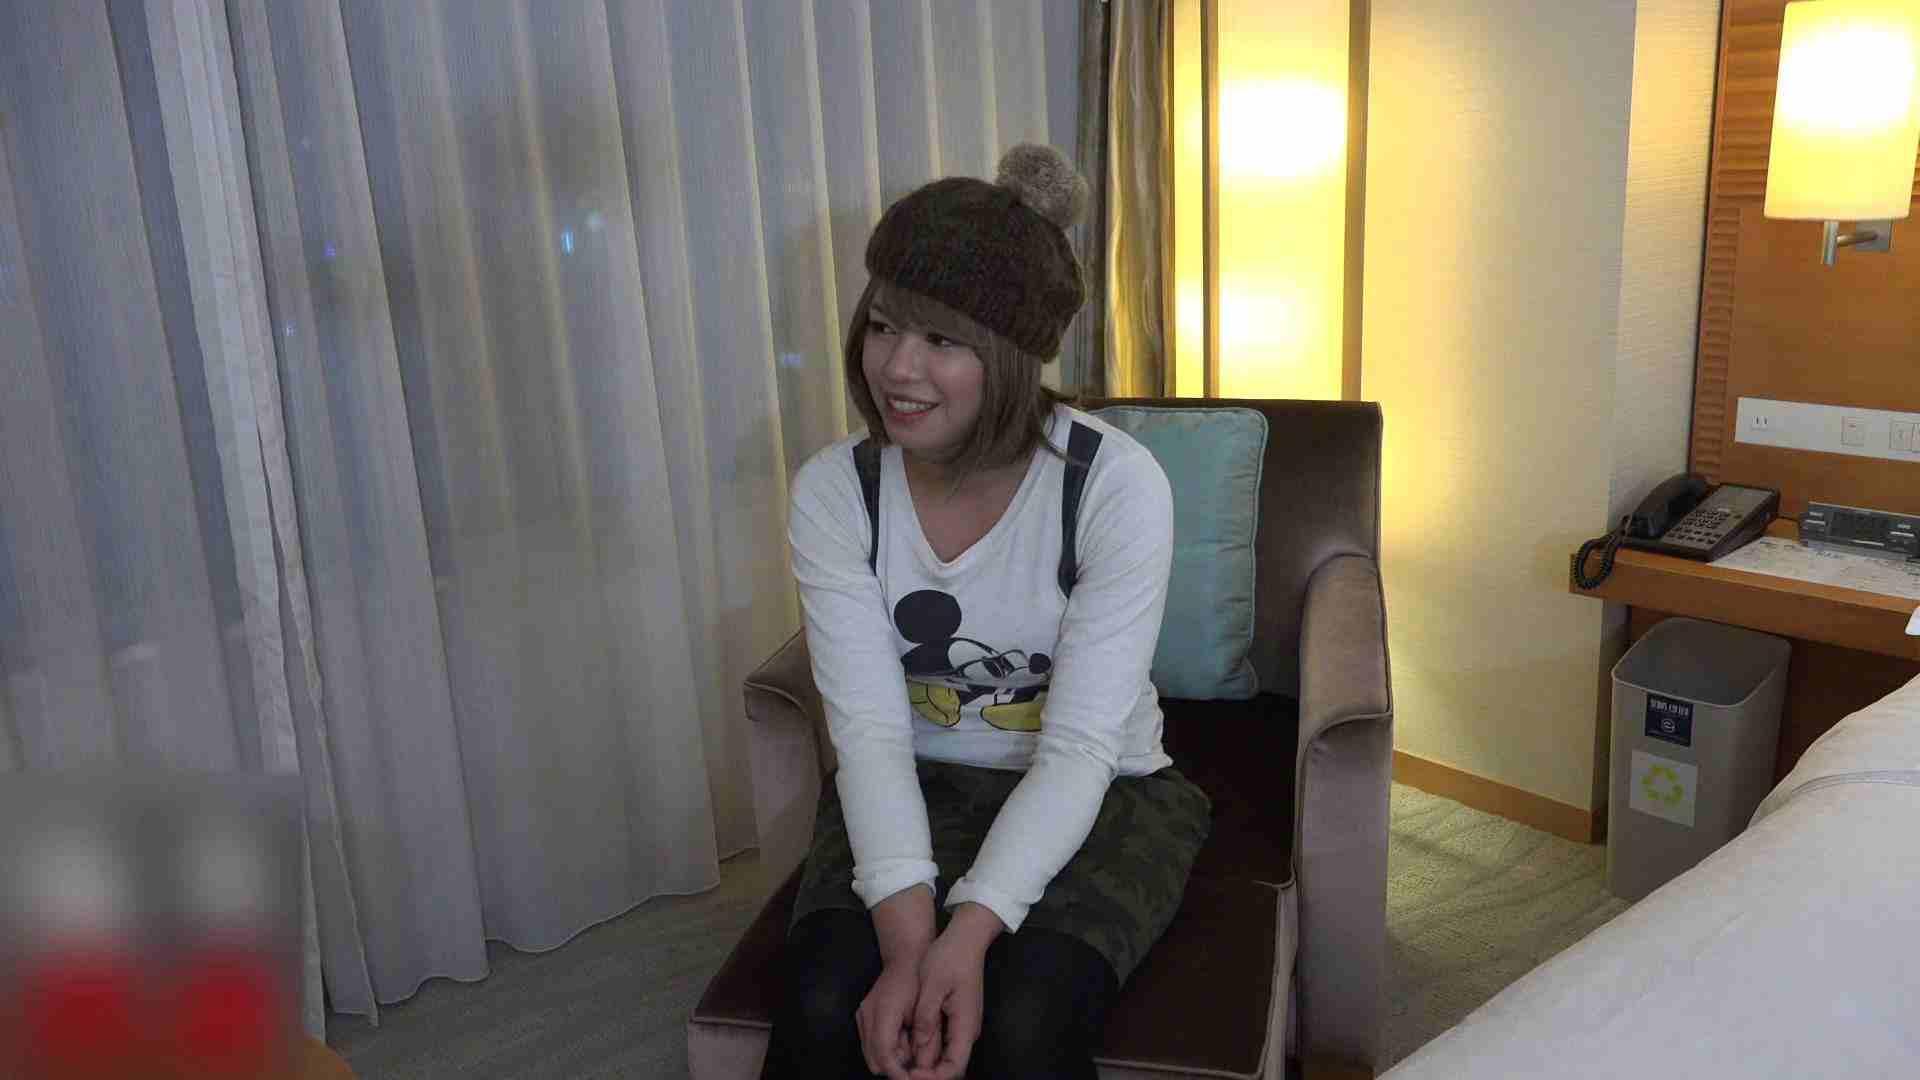 S級厳選美女ビッチガールVol.42 前編 S級美女ギャル 性交動画流出 83画像 38